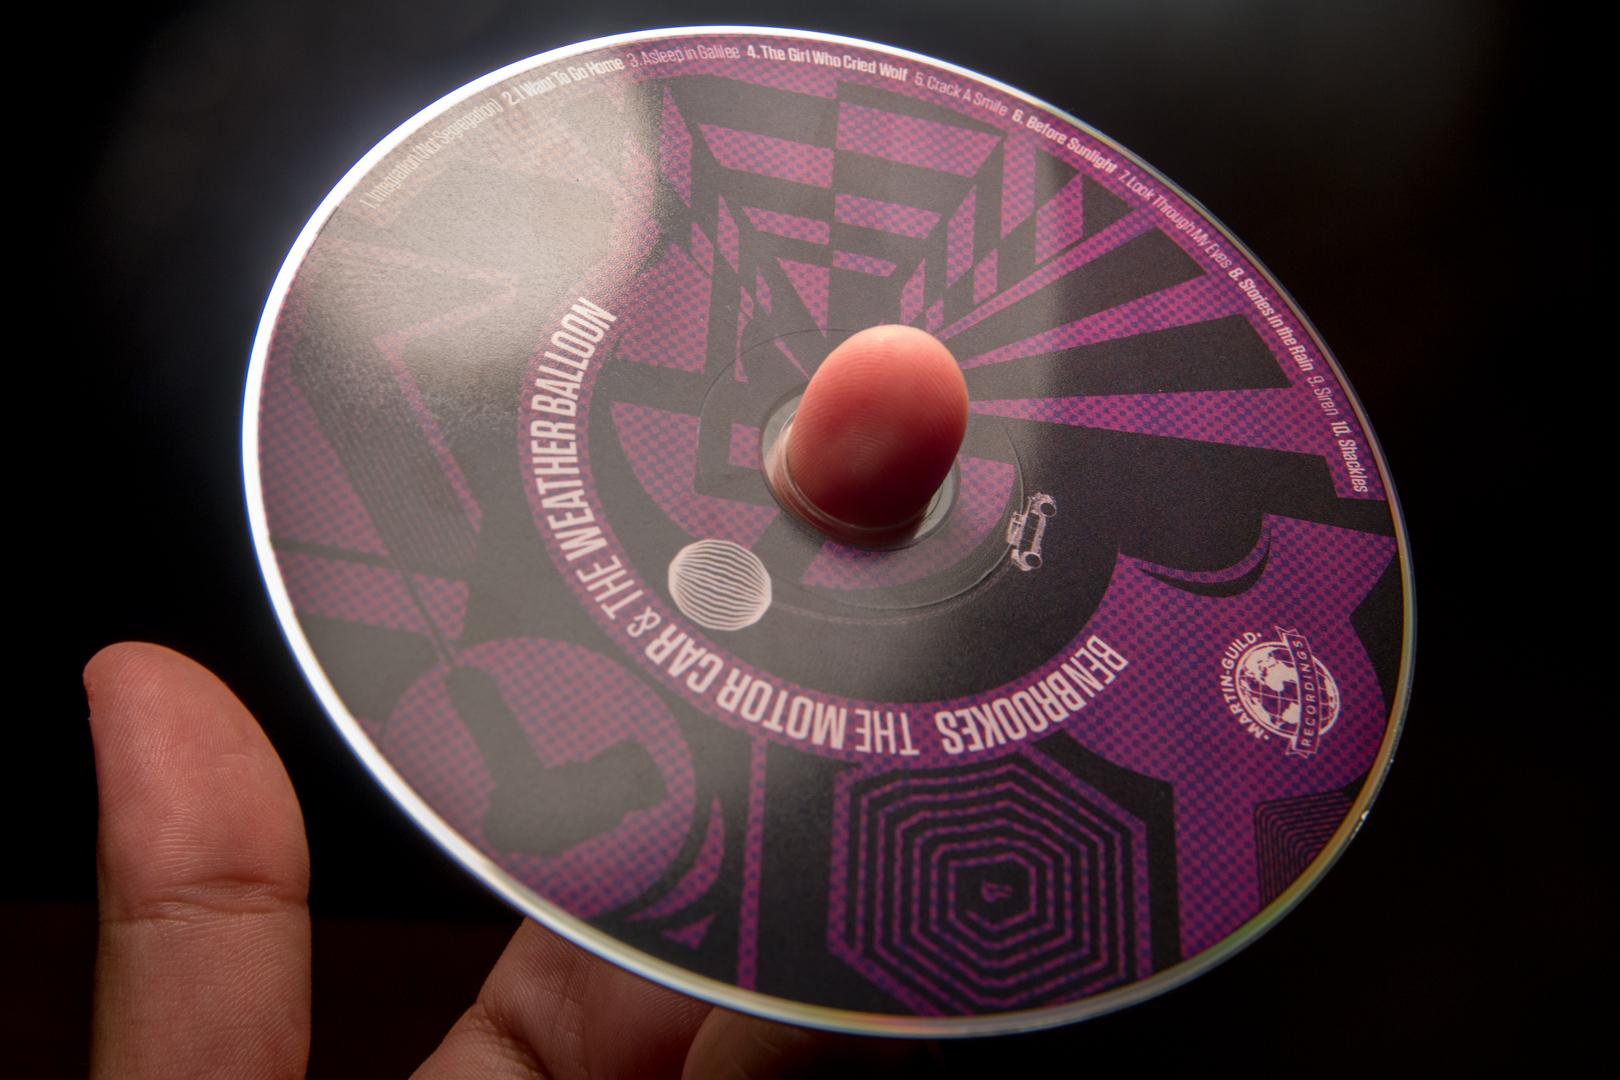 Ben Brookes The Motor Car & The Weather Balloon CD -4.jpg